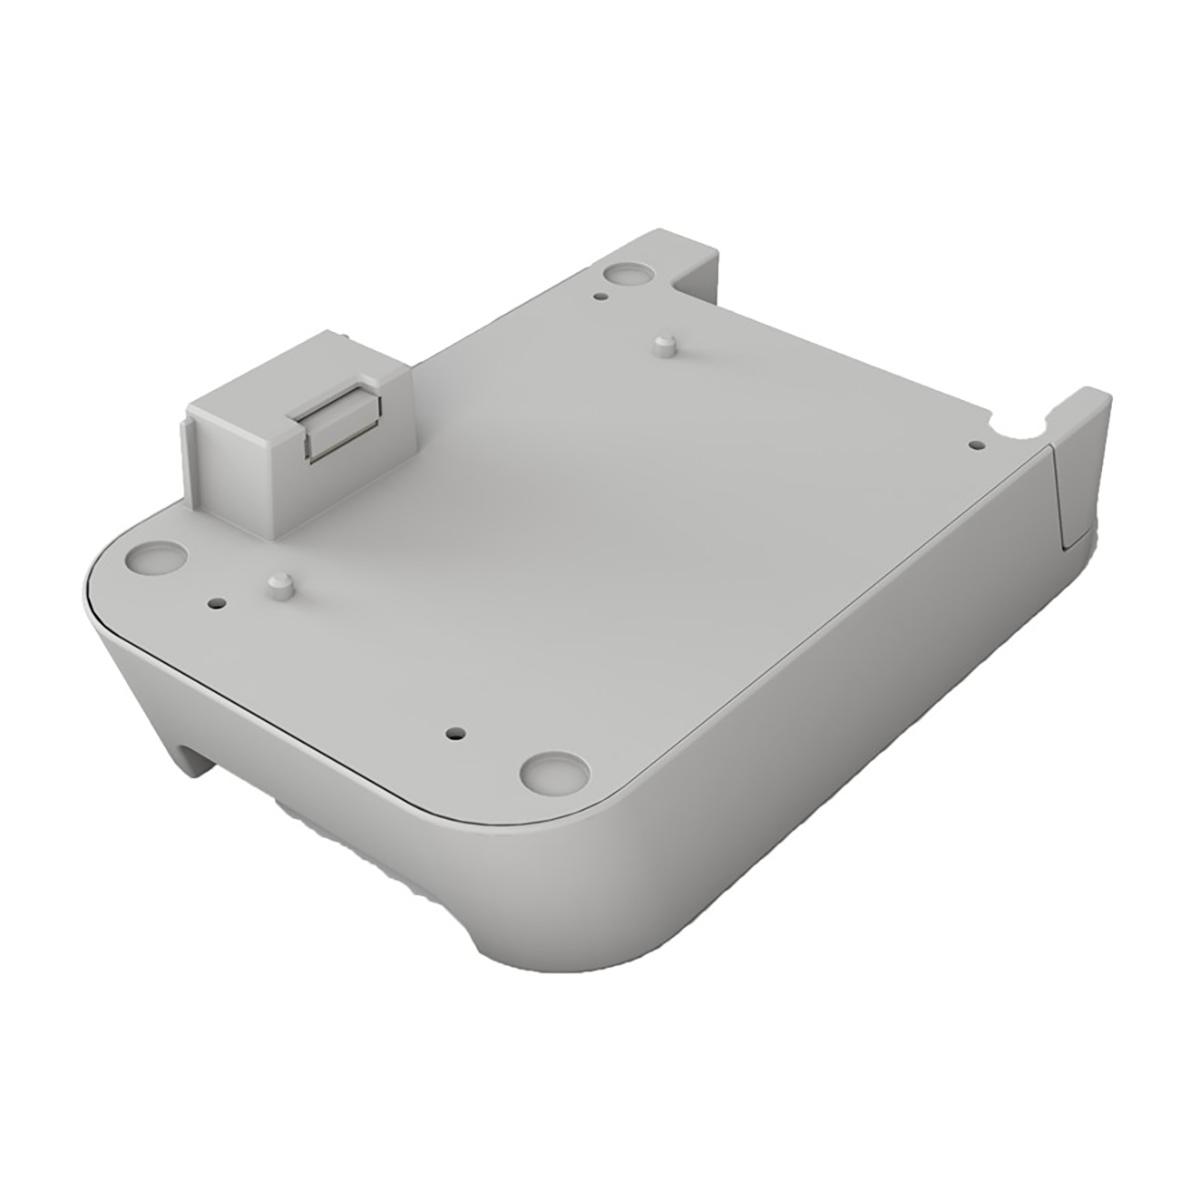 Brother PA-BU-001 Li-ion battery base for QL-810W and QL-820NWB